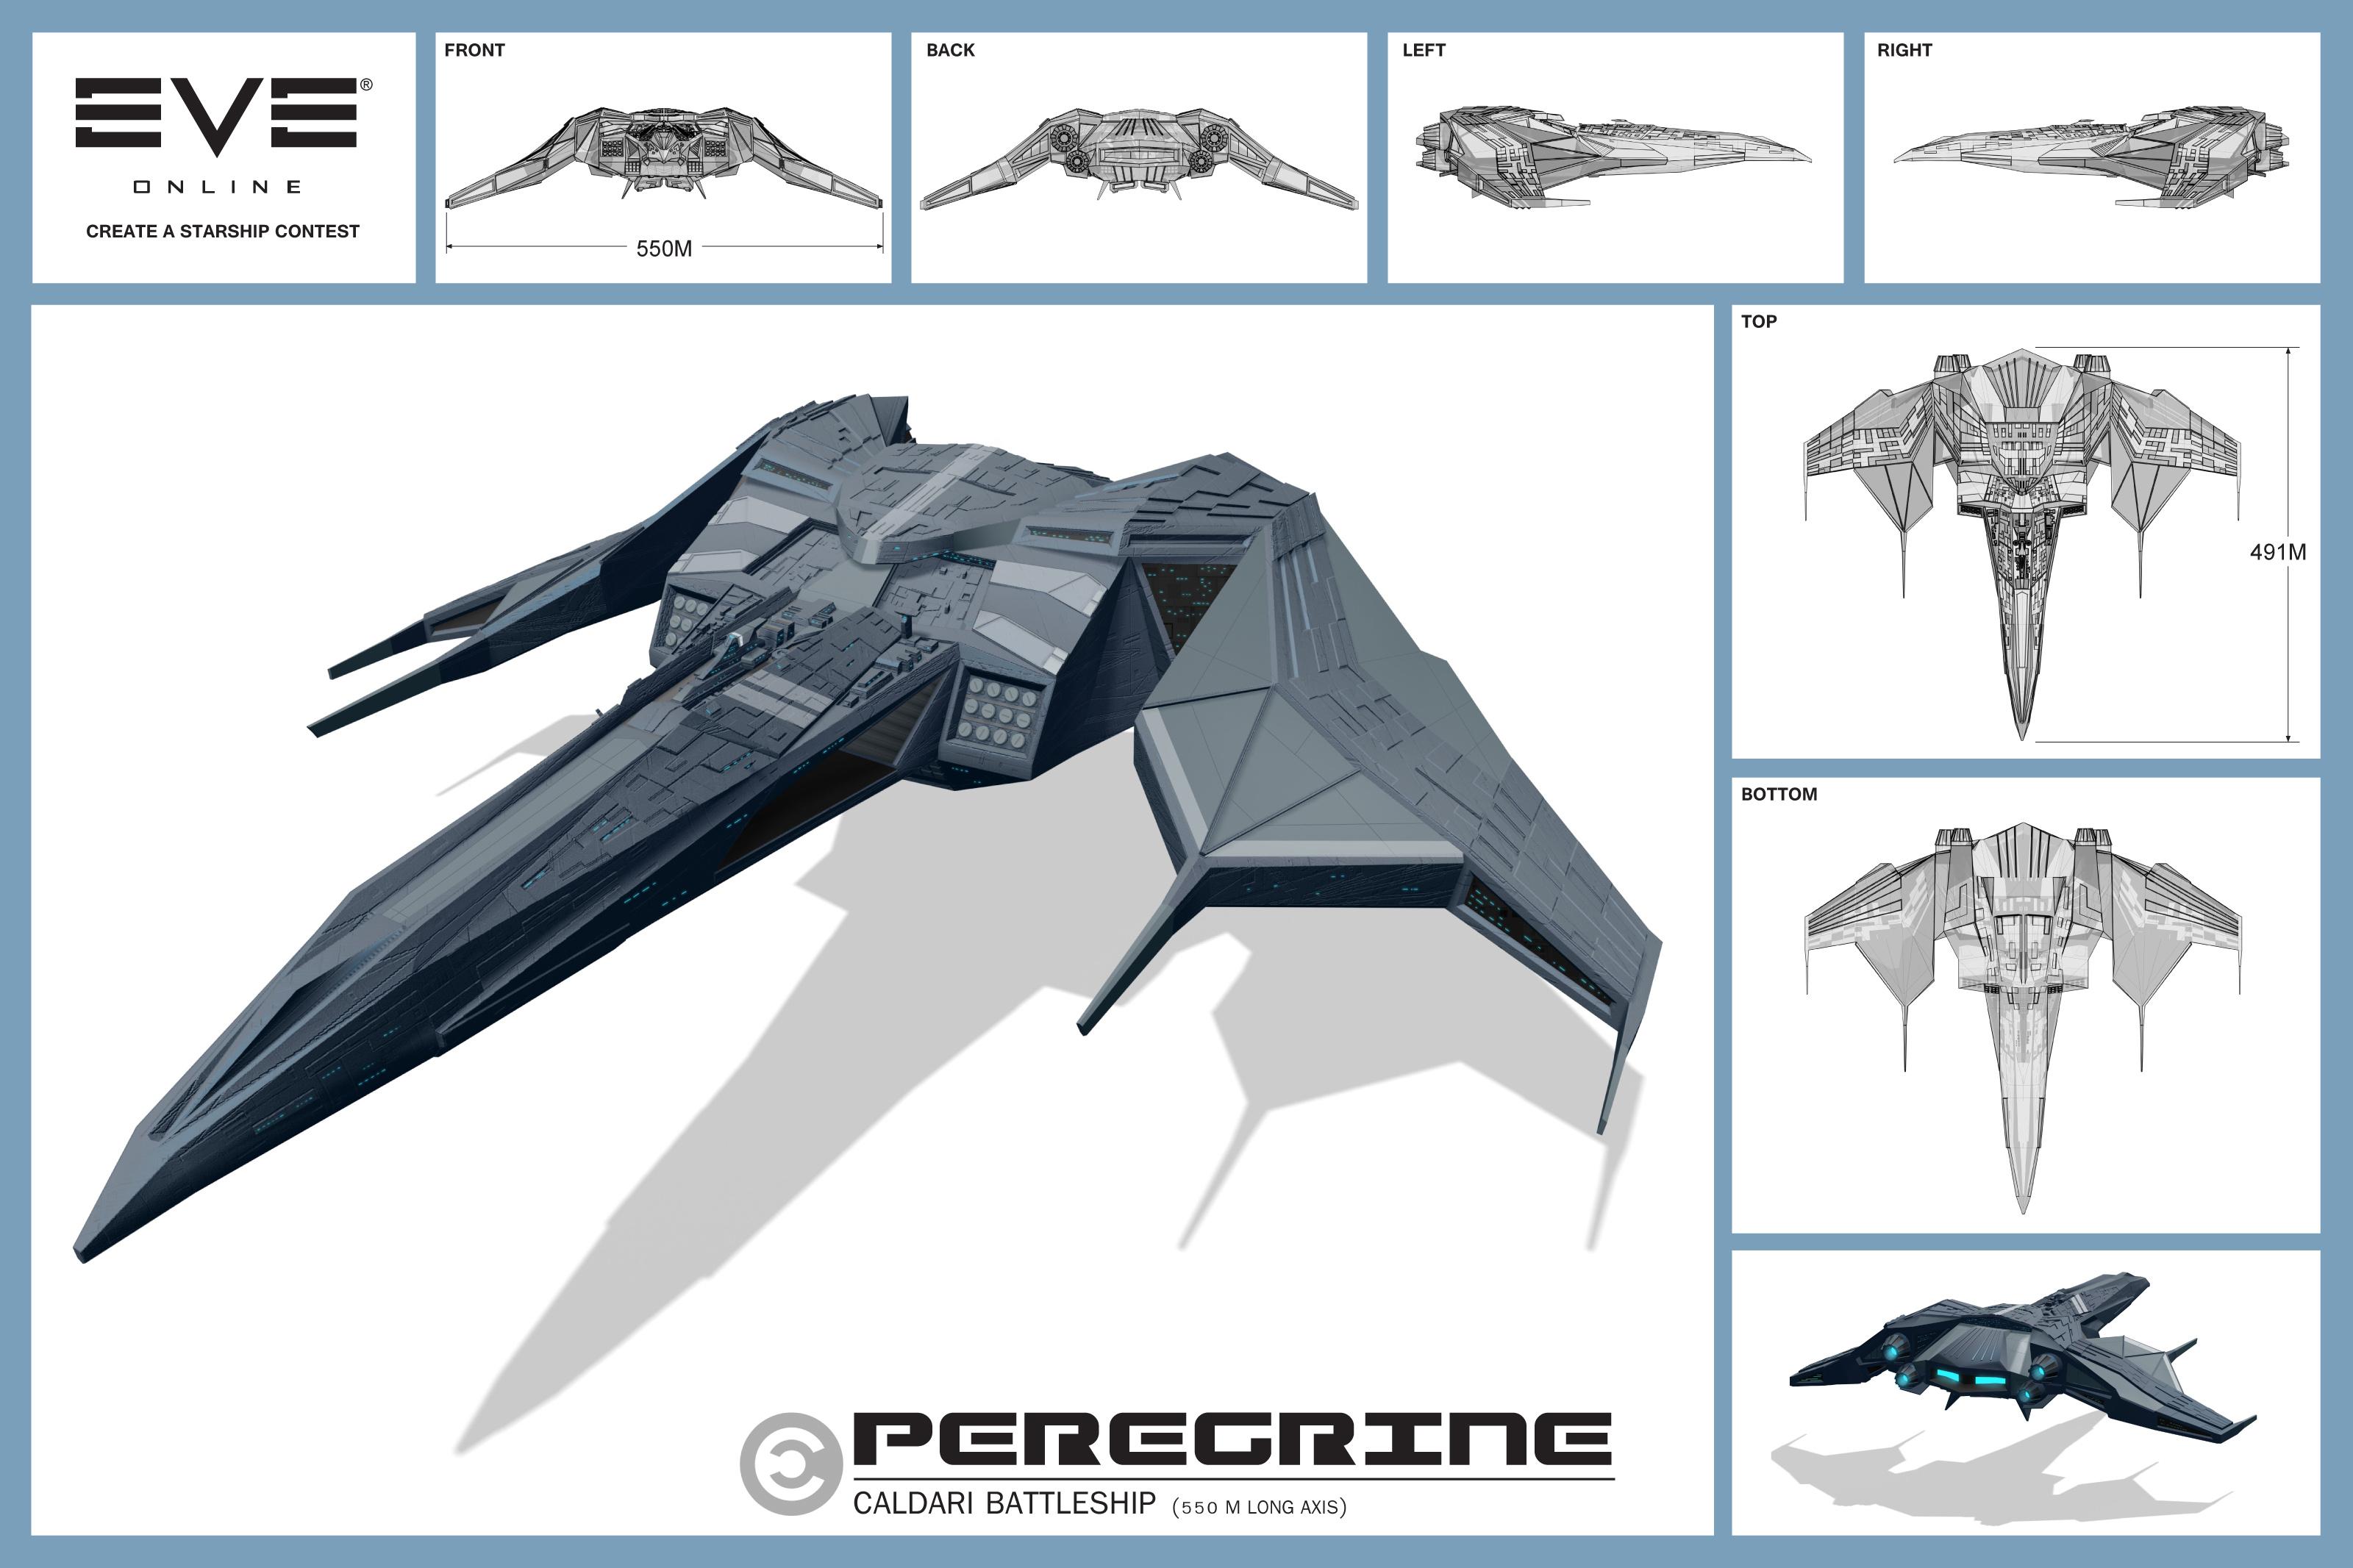 Caldari Peregrine Battleship by CosmoS6173